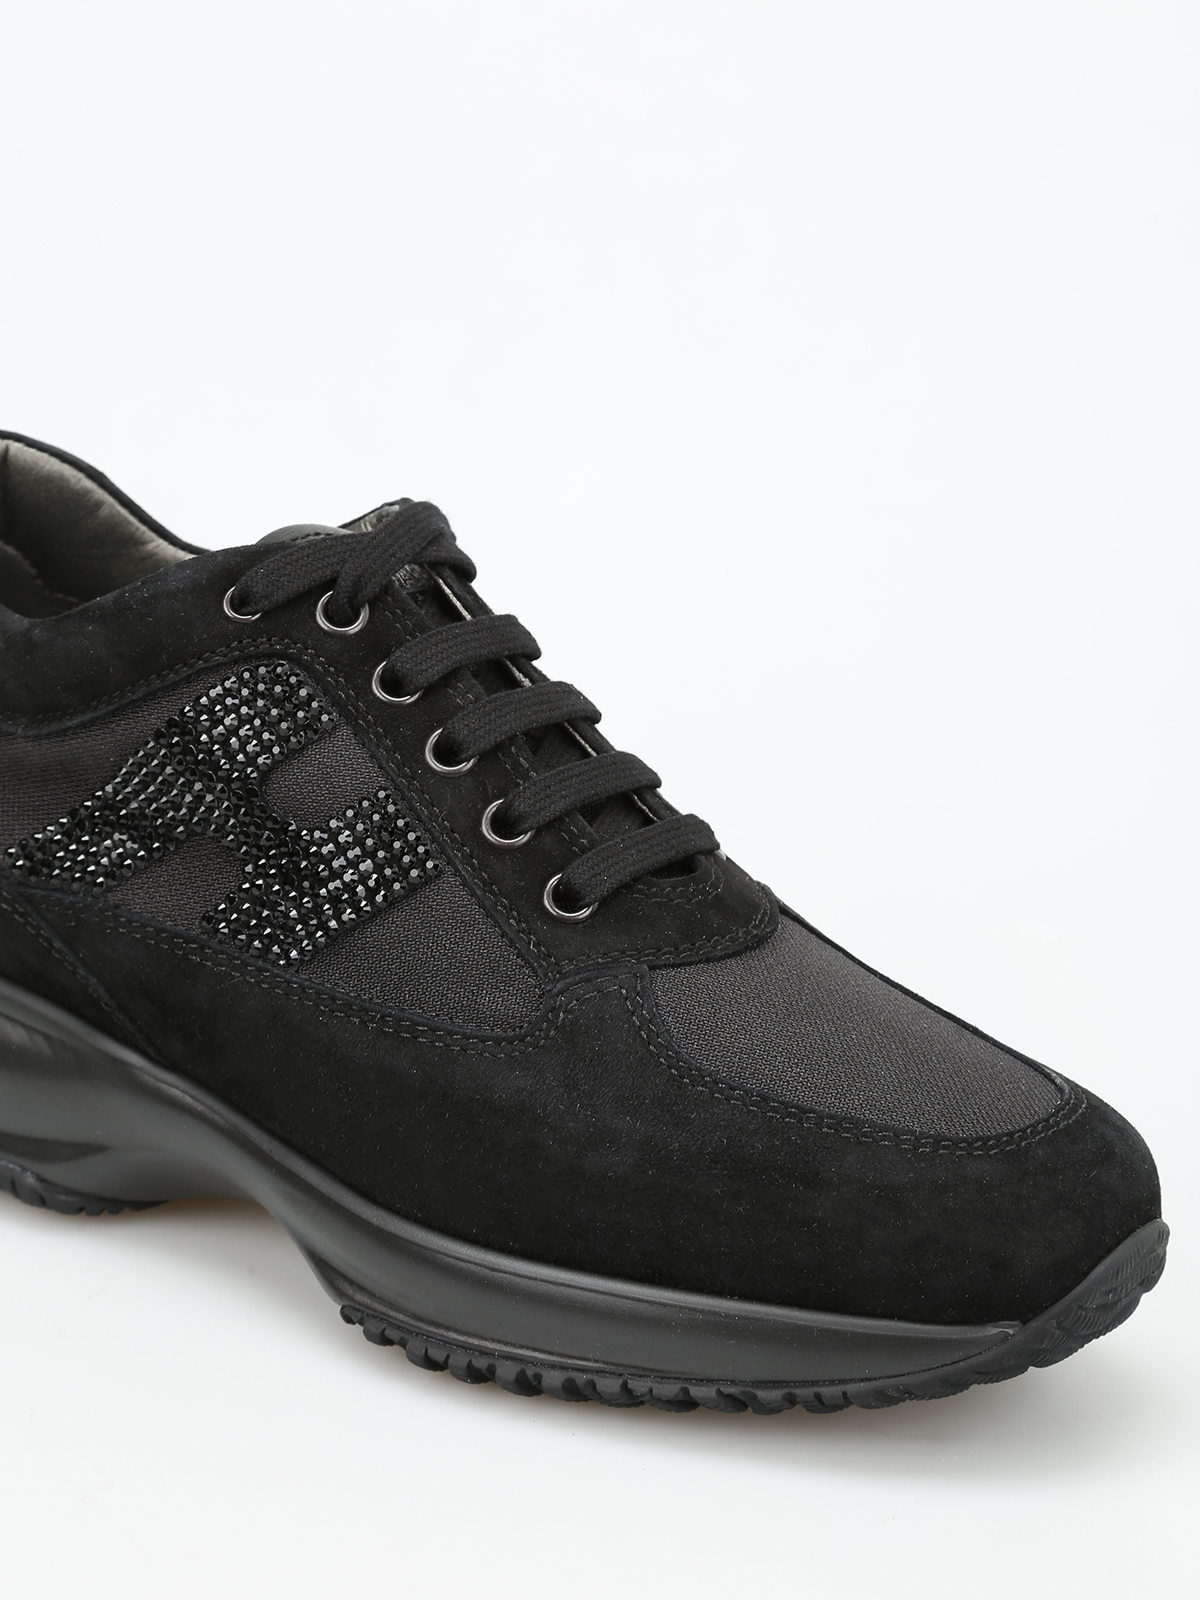 HXW00N02011FI7B999 sneaker donna HOGAN INTERACTIVE scarpa H